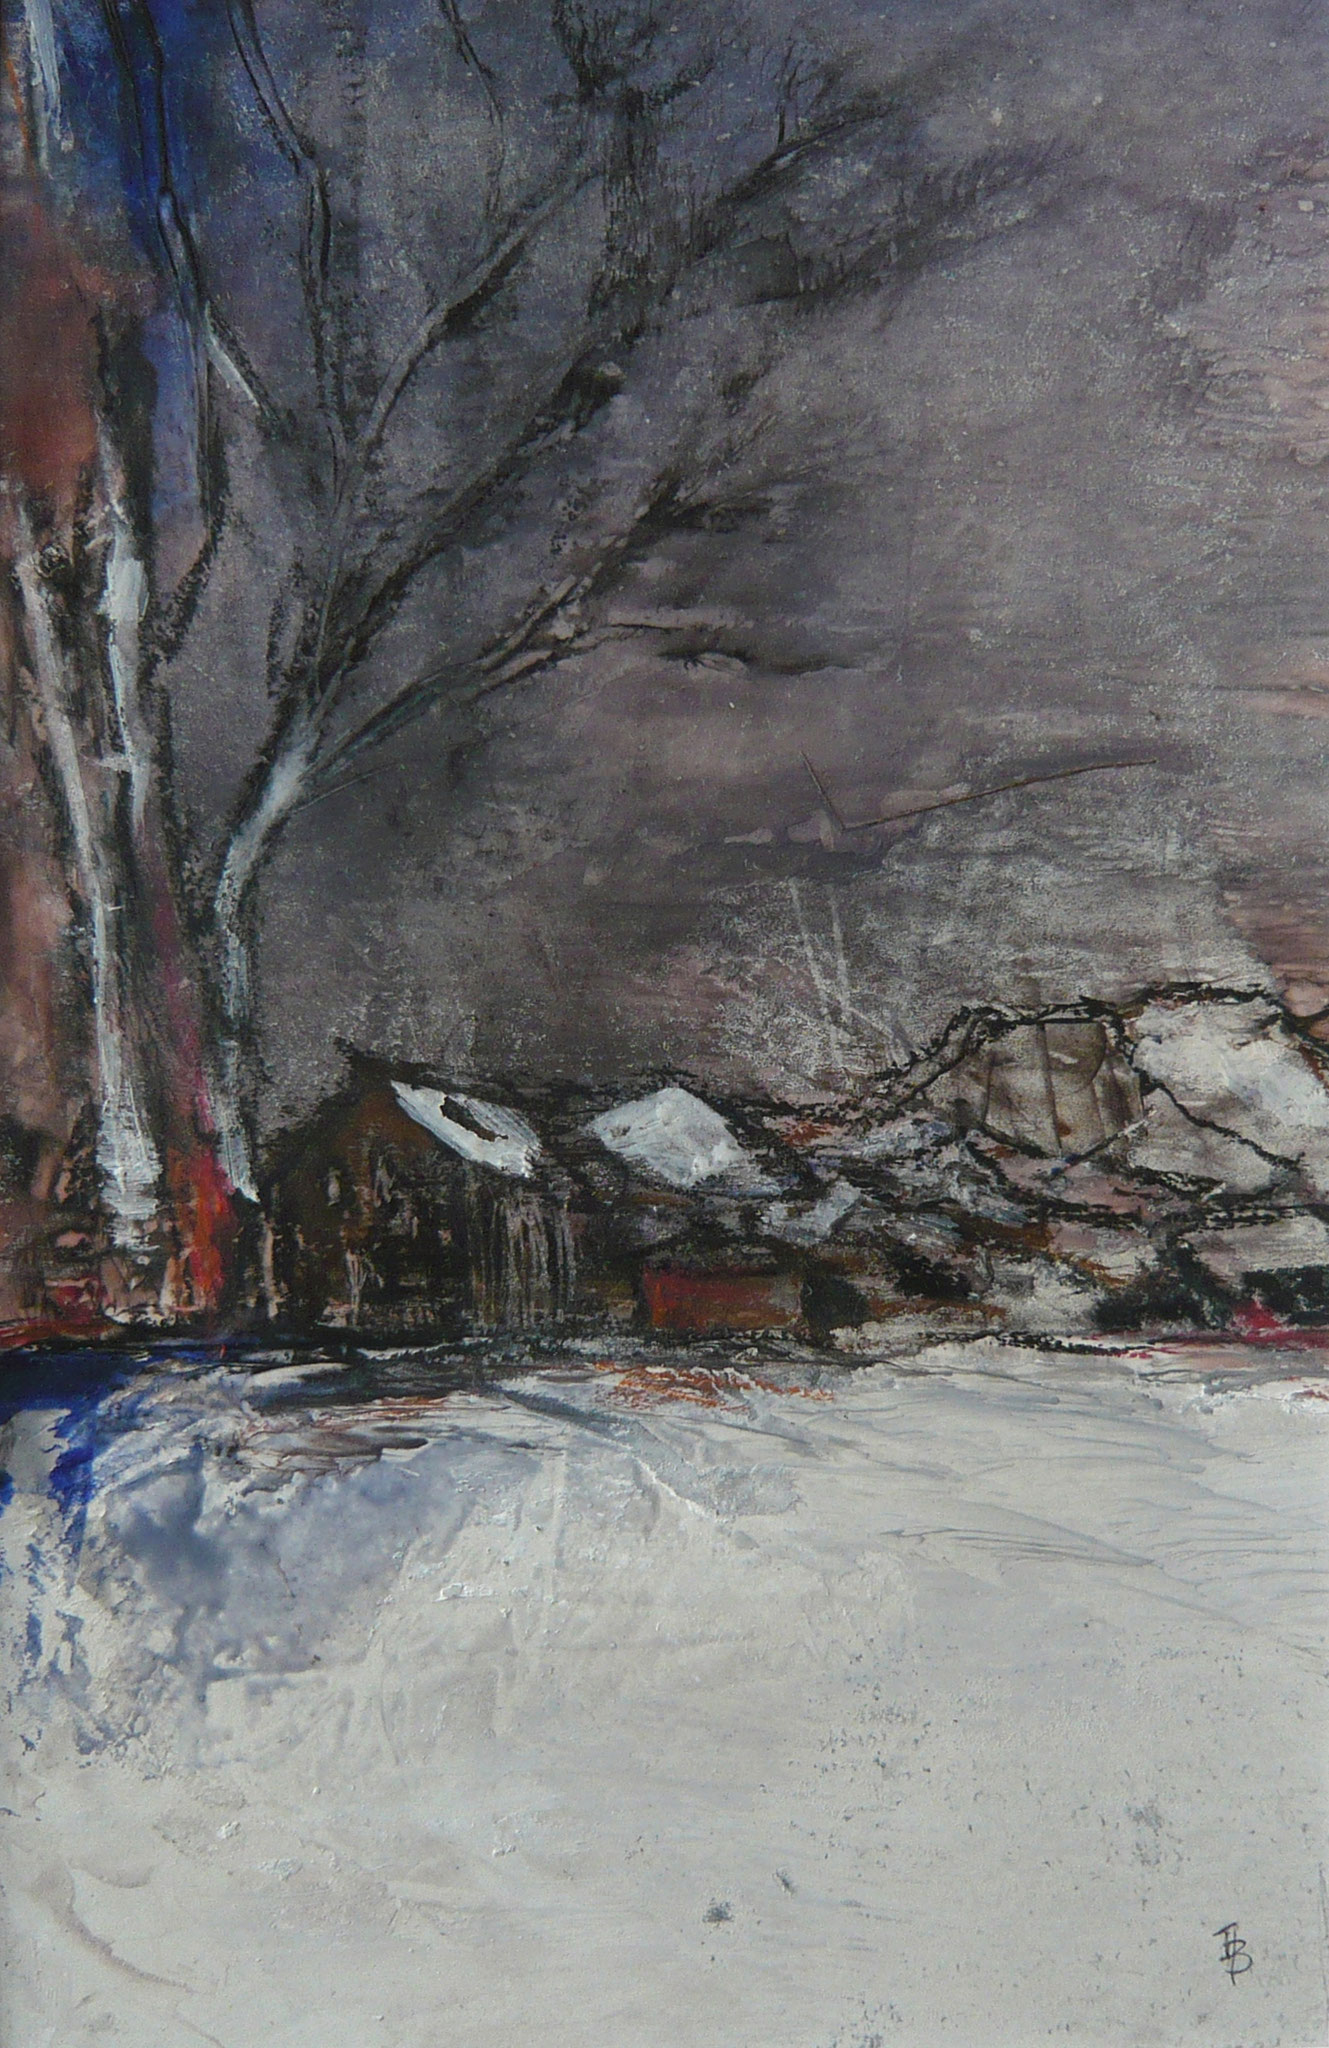 Erster Schnee, Mischtechnik, 34 x 21cm